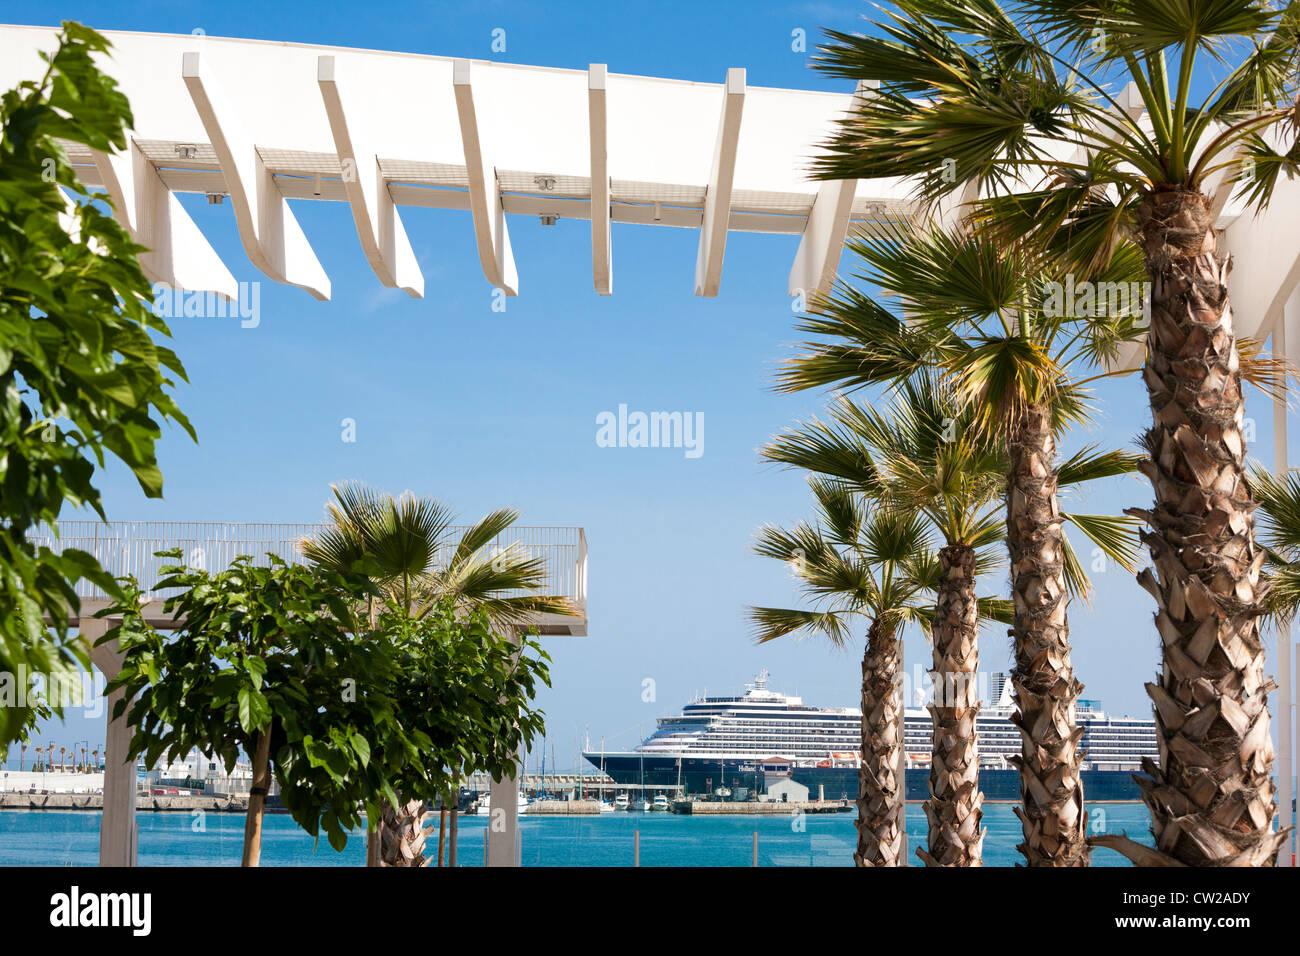 Malaga Spain. Cruise ship with palms. Modern harbor boulevard promenade El Palmeral de las Sorpresas with Holland - Stock Image